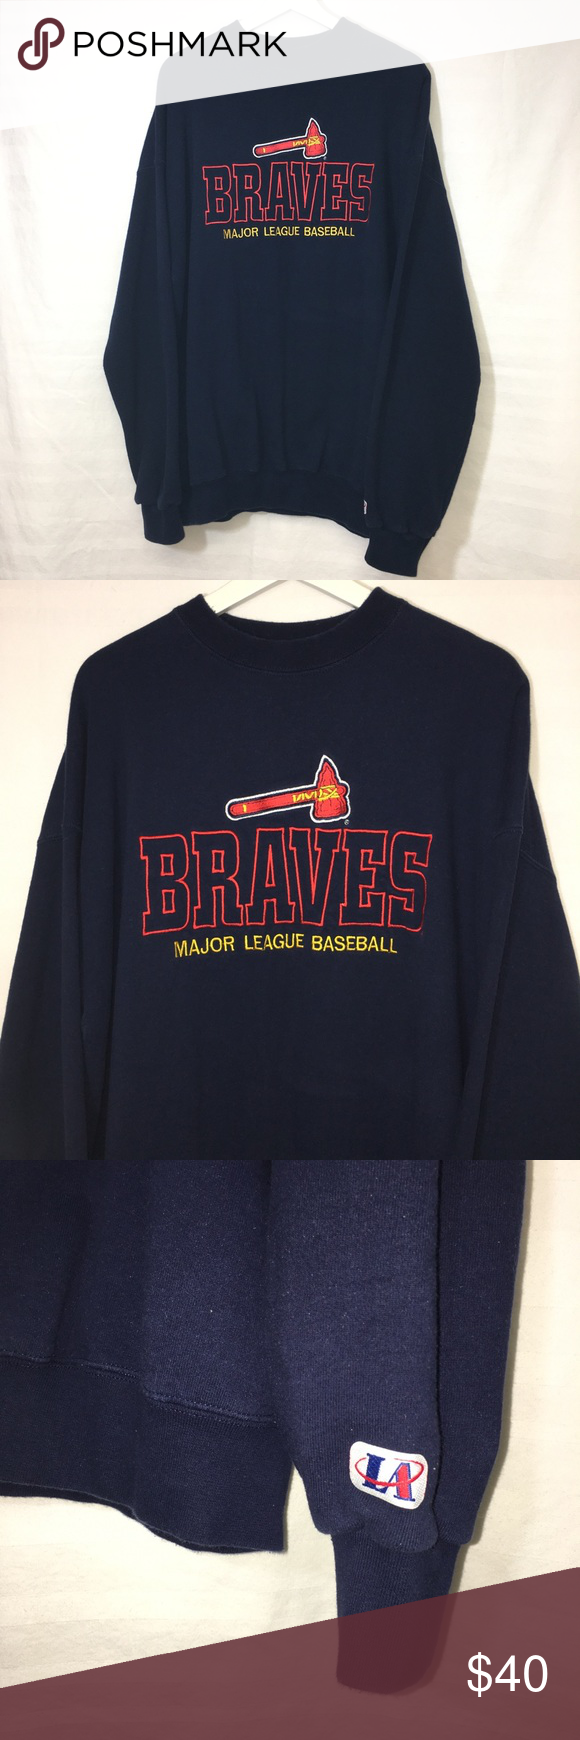 Vintage Braves Sweatshirt Sweatshirts Vintage Sweatshirt Crew Neck Sweatshirt